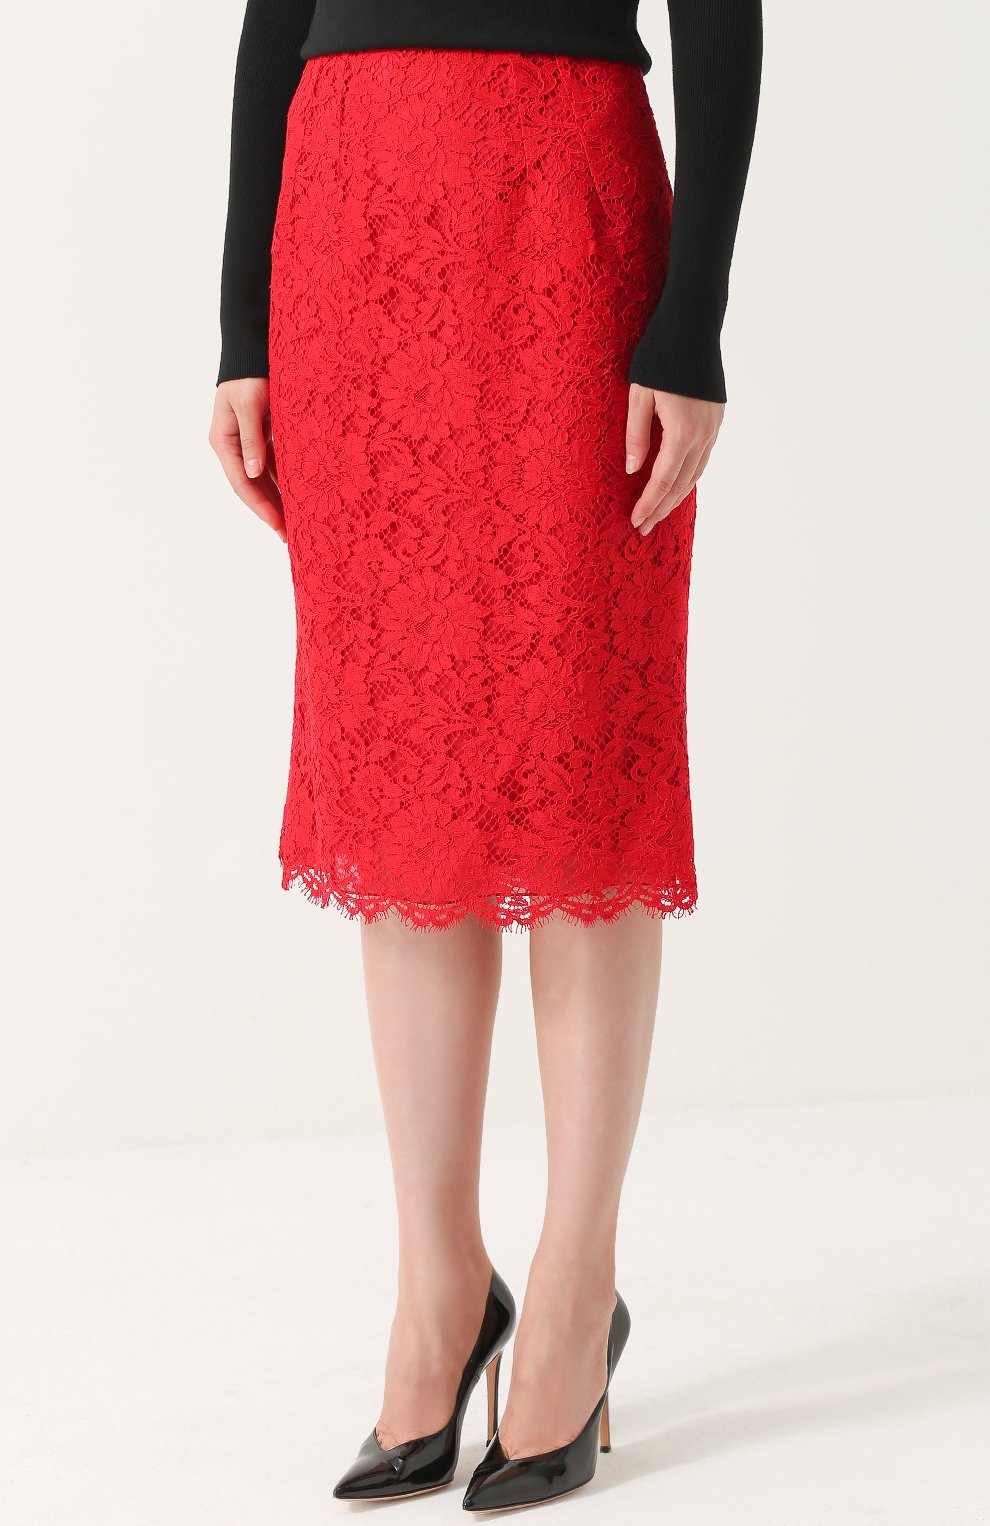 Кружевная юбка-карандаш с разрезом Dolce & Gabbana красная | Фото №3